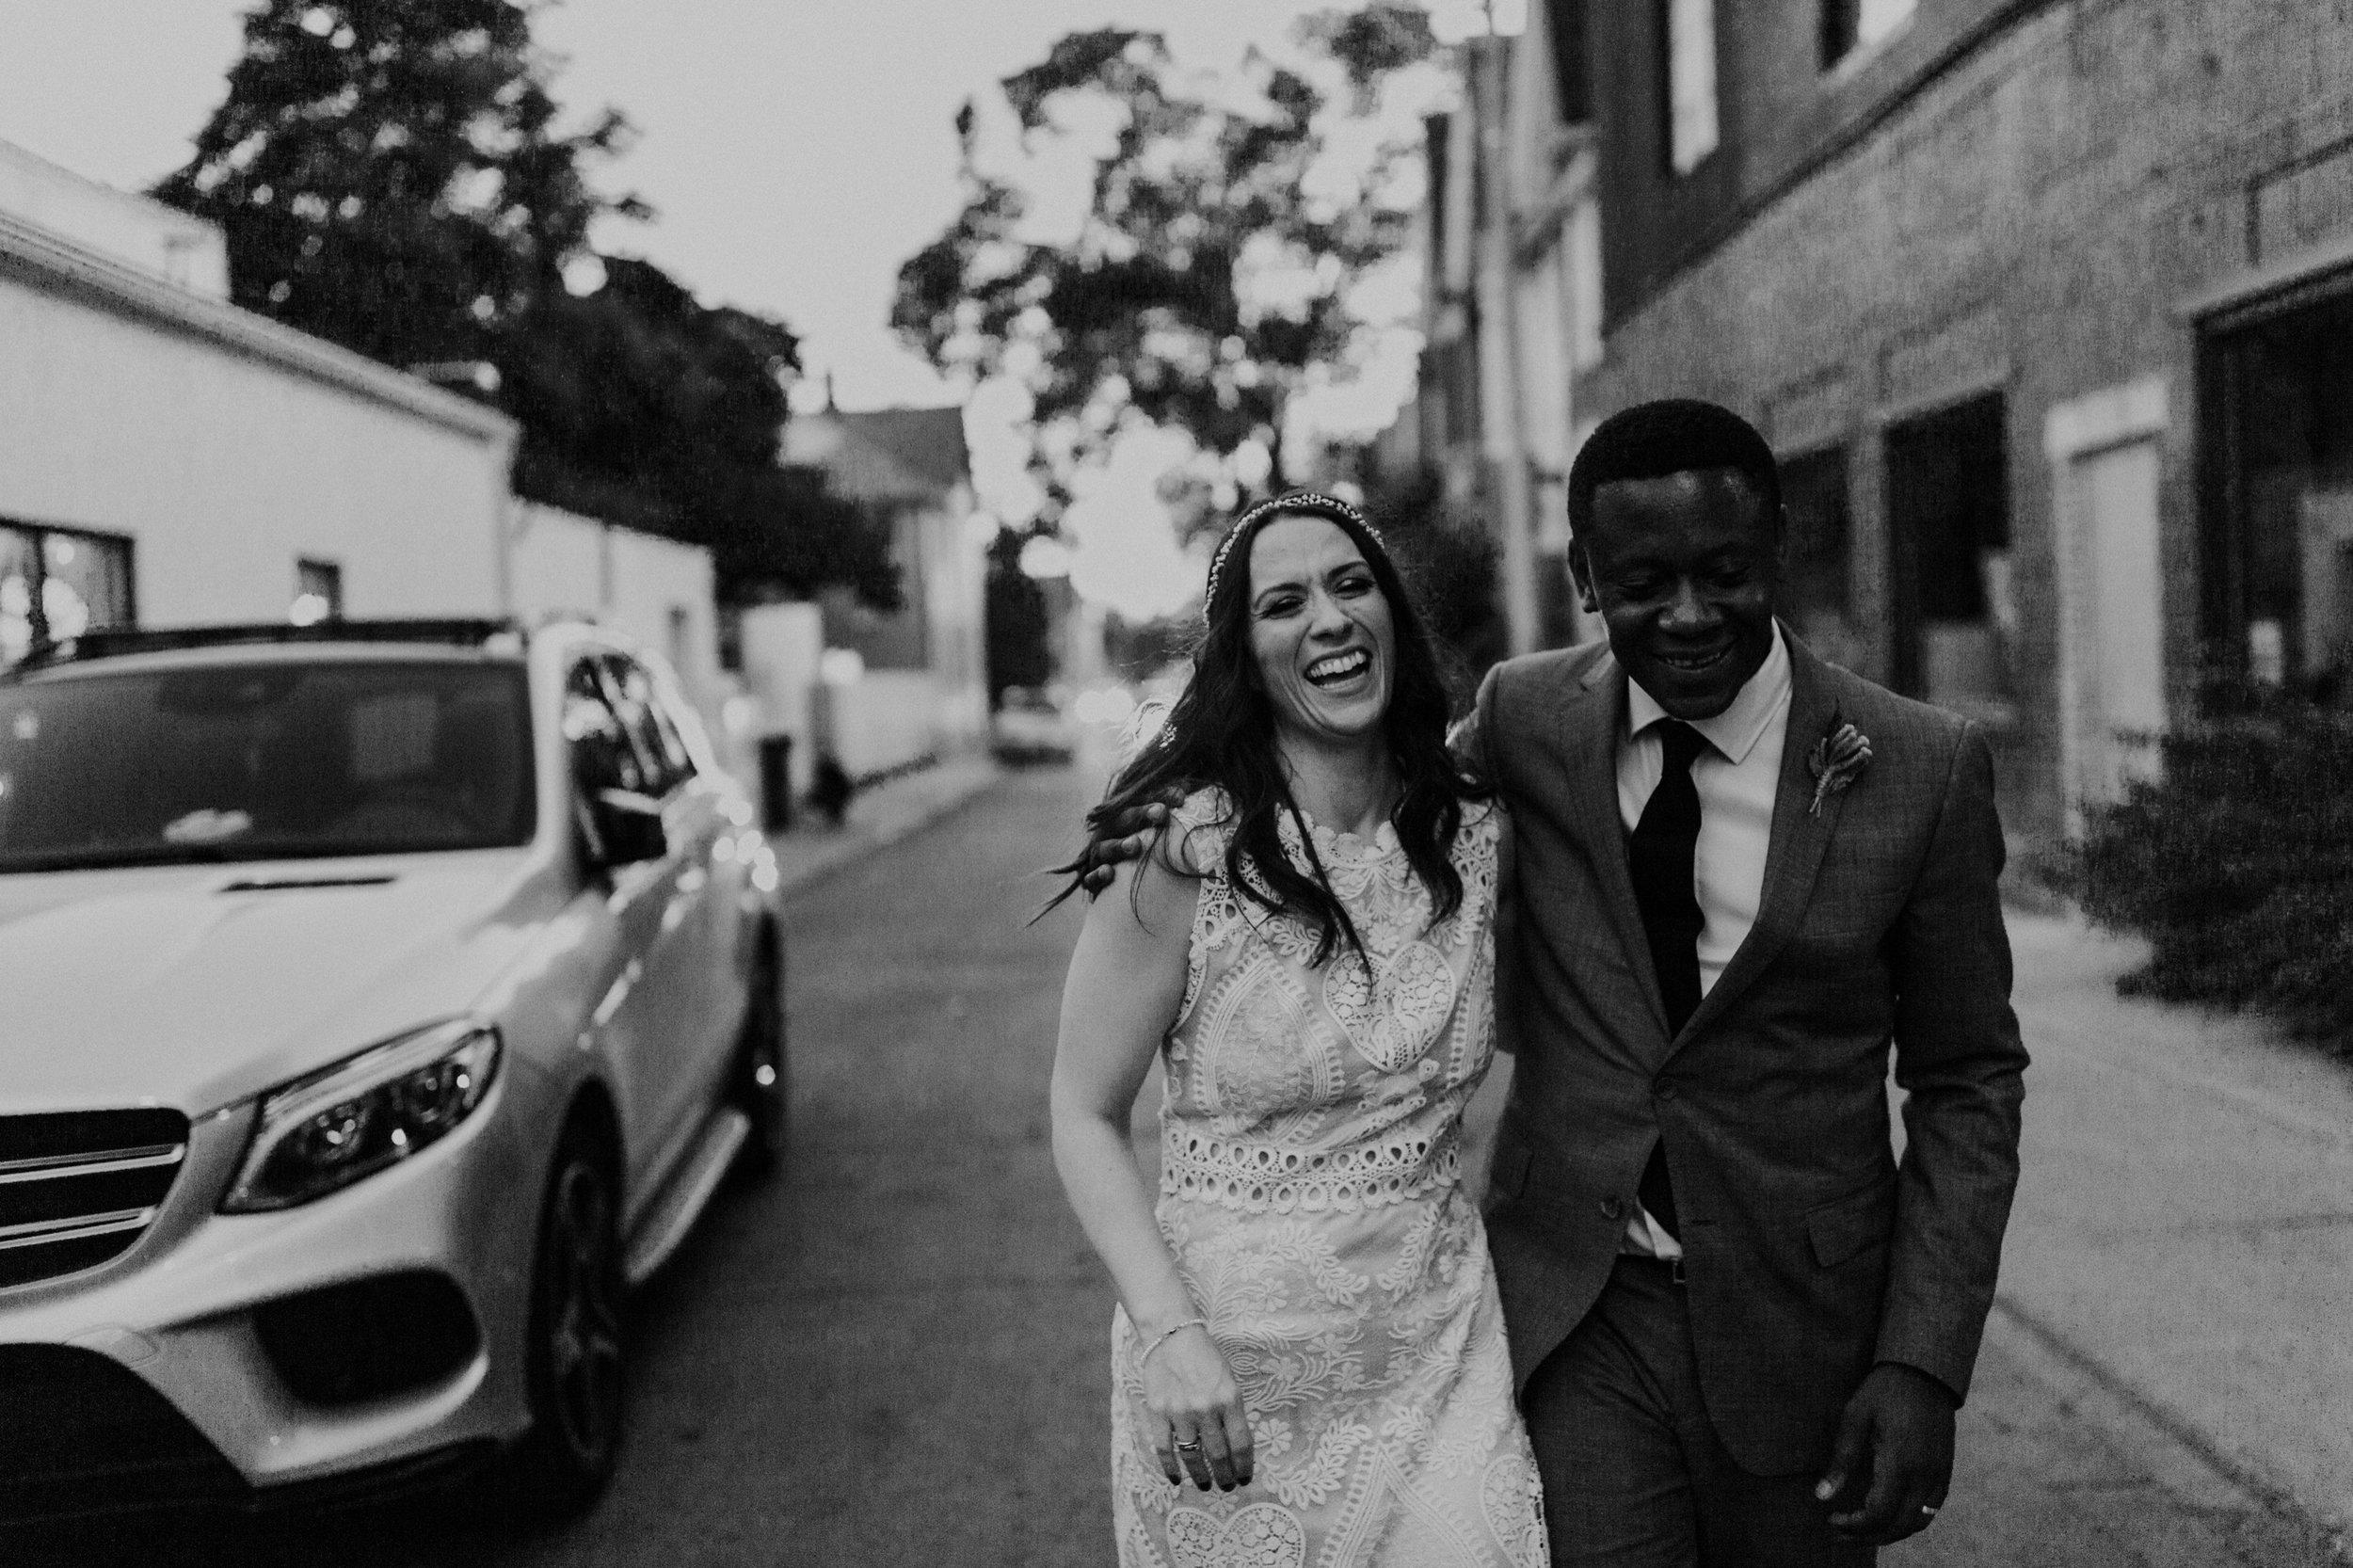 099_Spadina House Wedding (505 of 748)_intimate_Boehmer_Restaurant_downtown_Toronto_Wedding.jpg